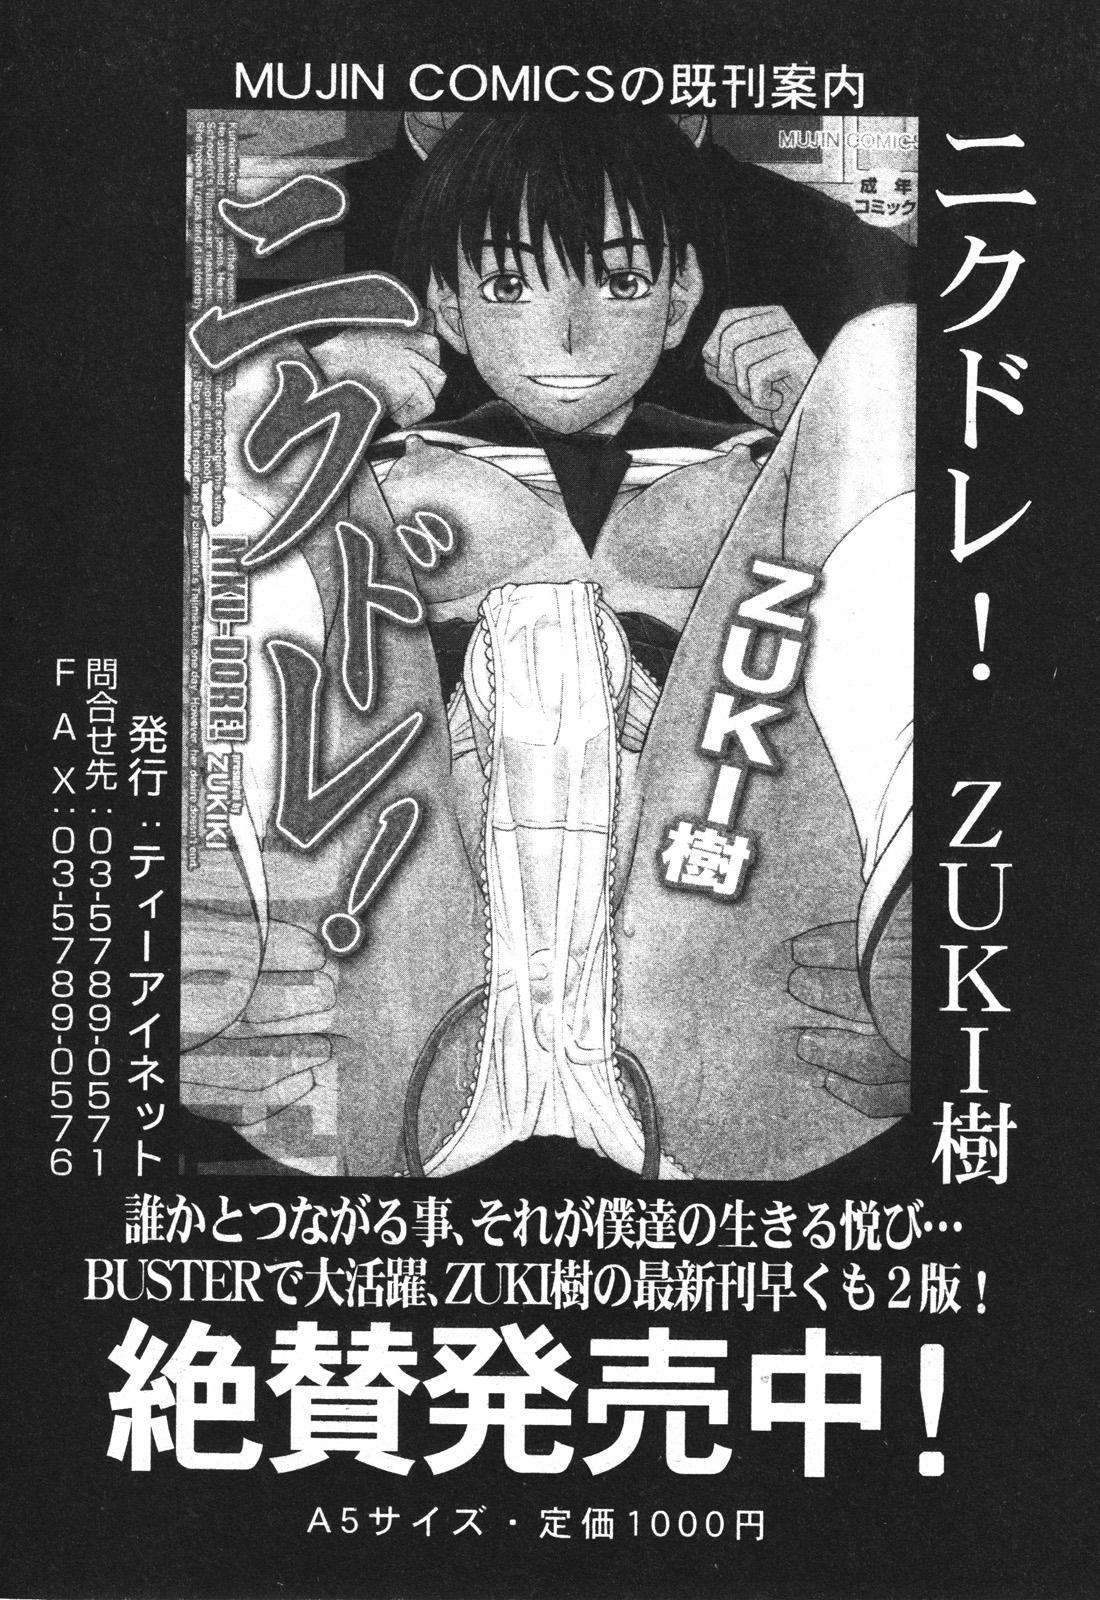 BUSTER COMIC 2010-05 Vol.07 80